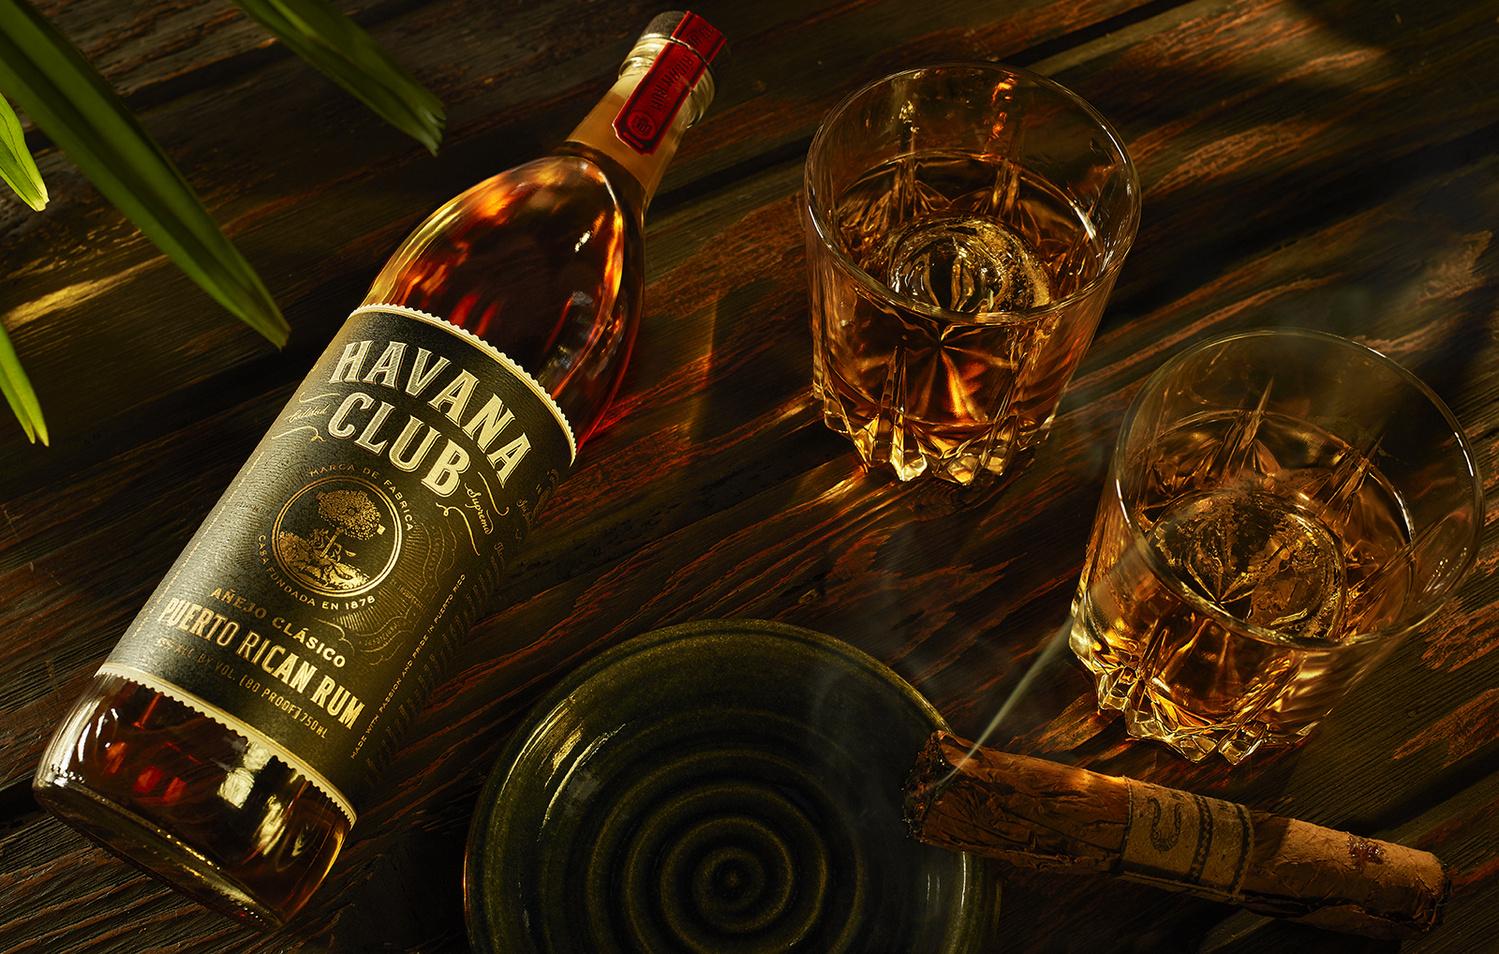 beverage photo of havana club rum photo by brian kaldorf by Brian Kaldorf